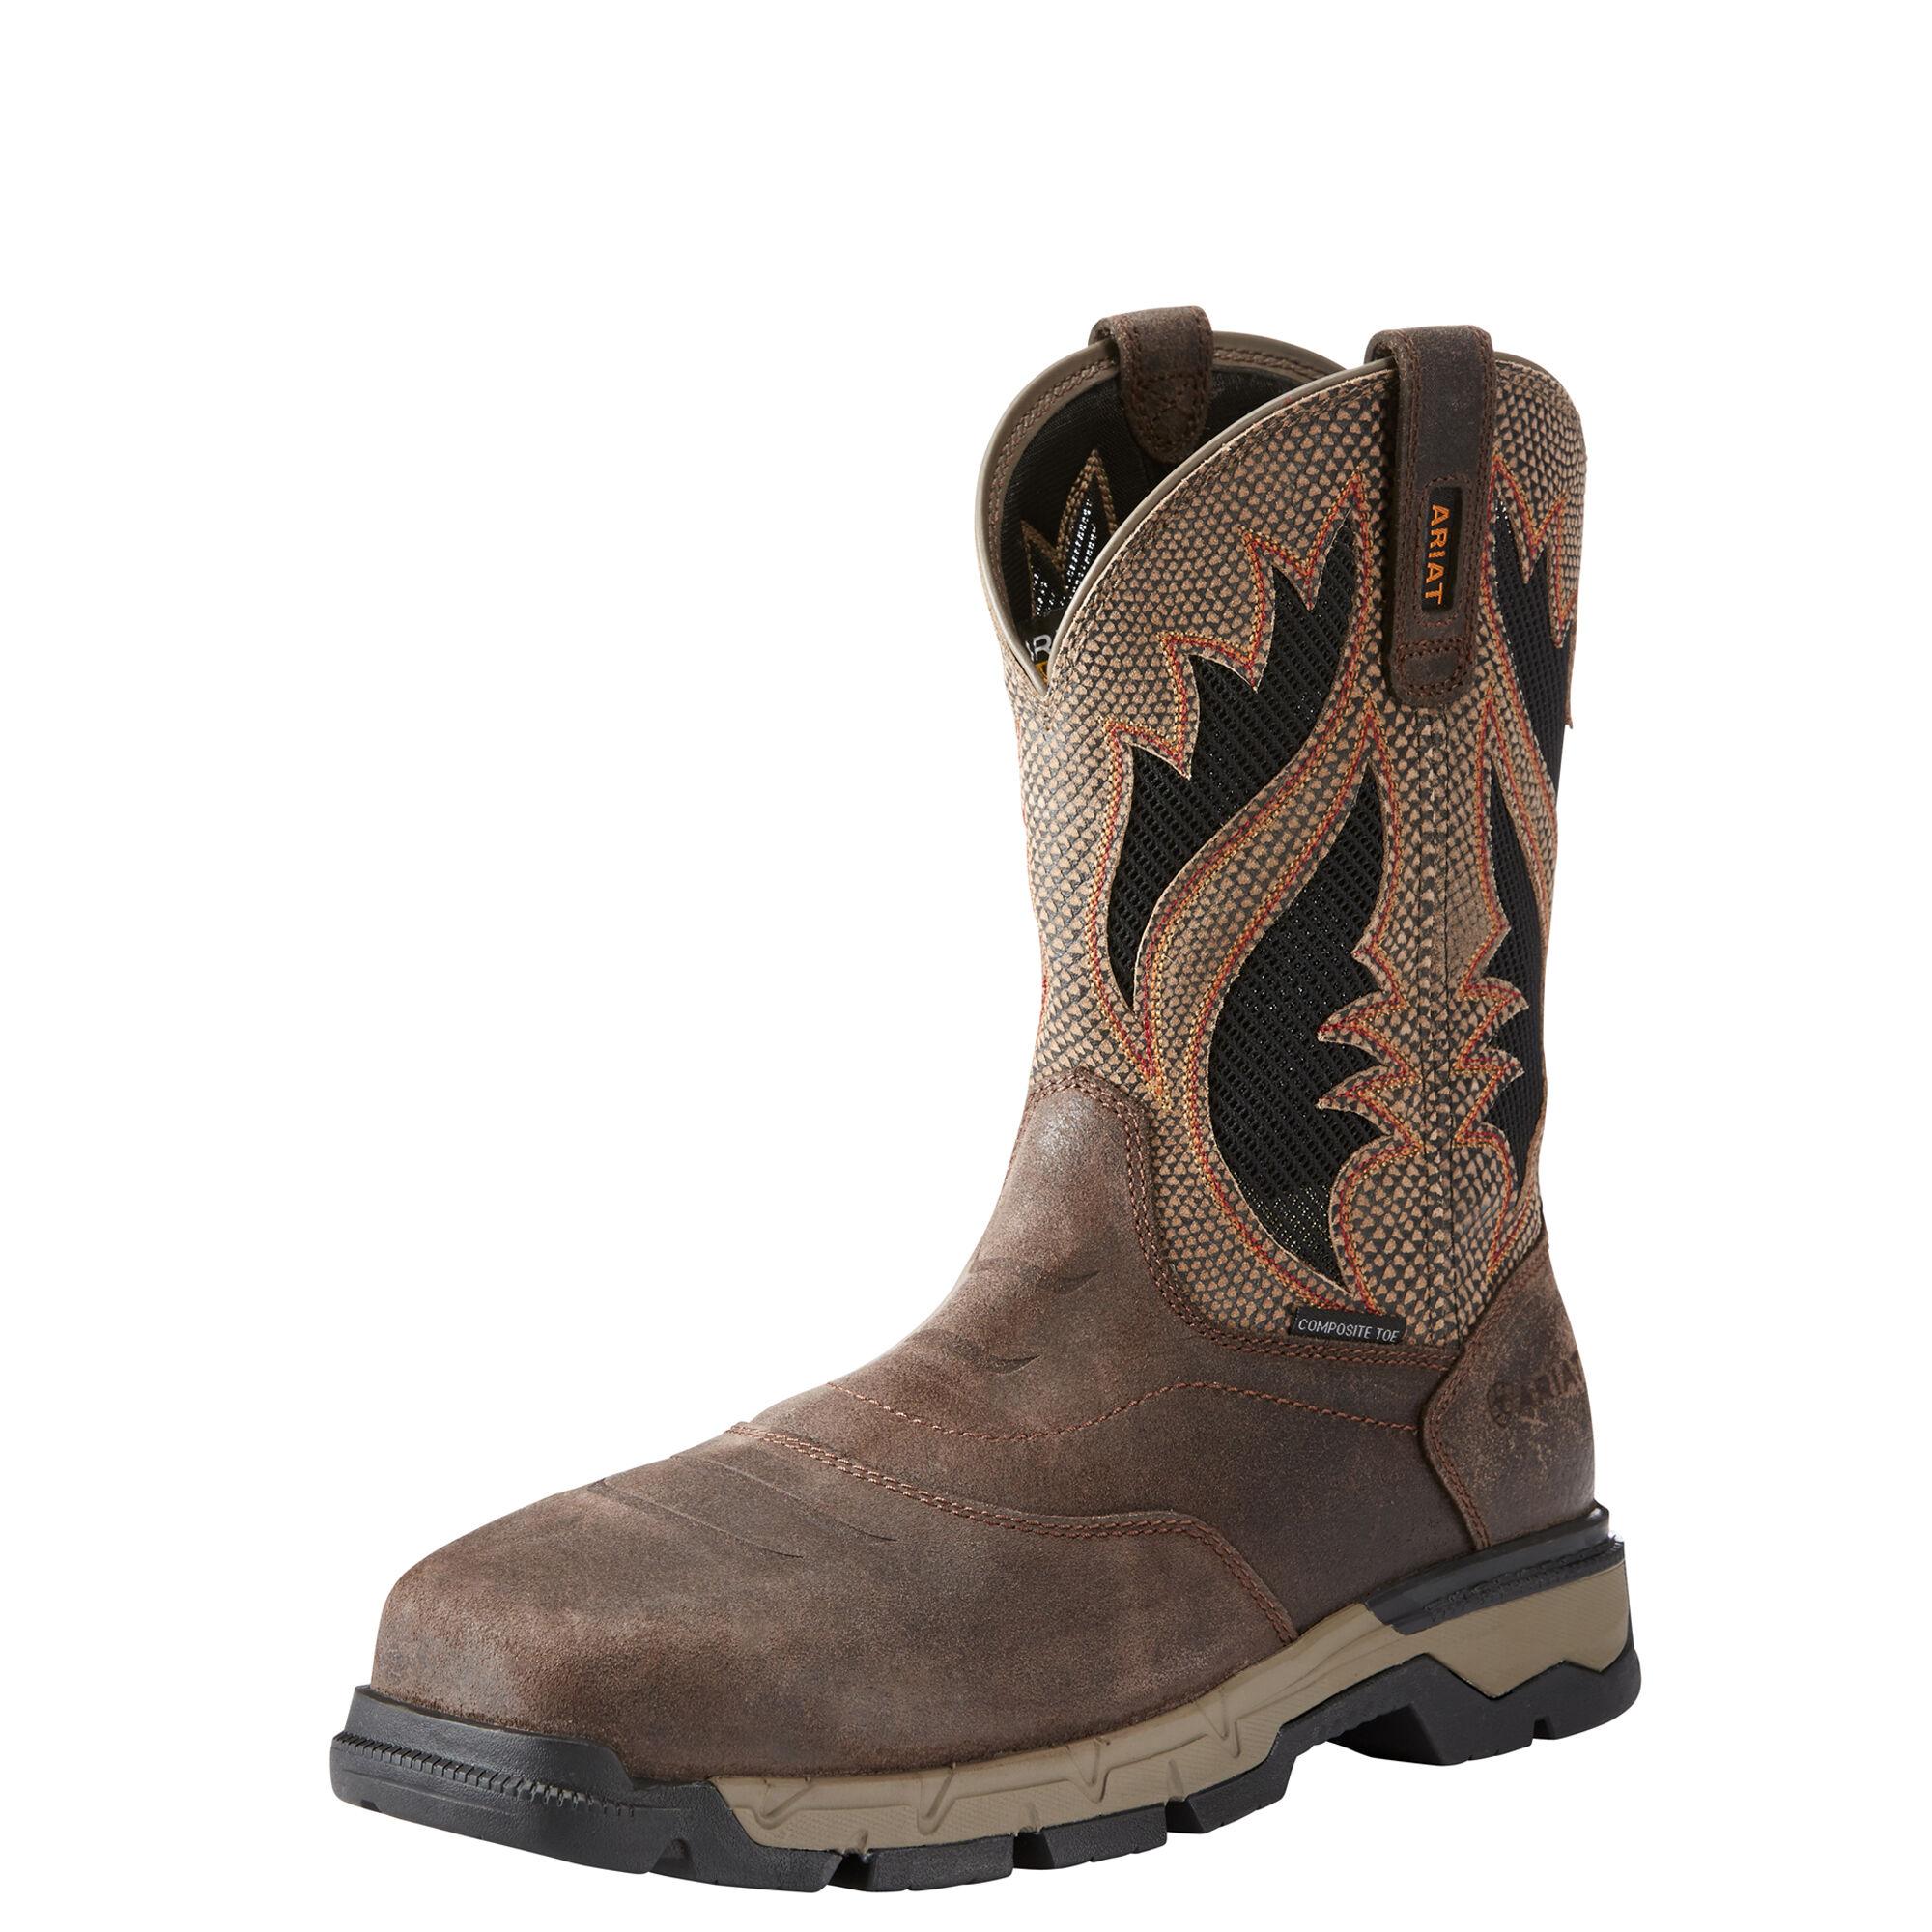 Men's Ariat Rebar Western VentTEK Composite Toe Work Boot, Size: 10.5 D, Chocolate Brown Leather